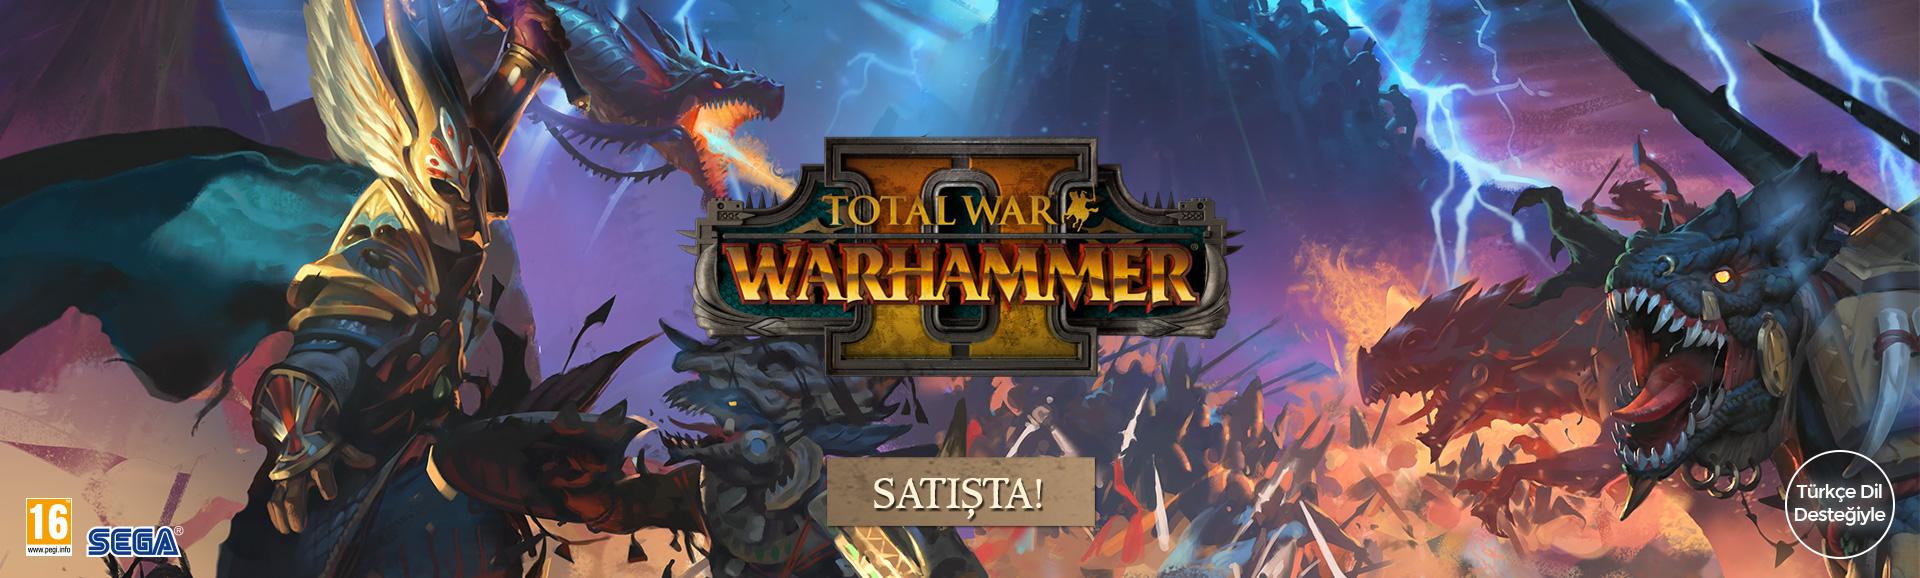 [Jeu vidéo] Total War Warhammer - Page 11 Warhammer_II_AralGame_Main-1920x578